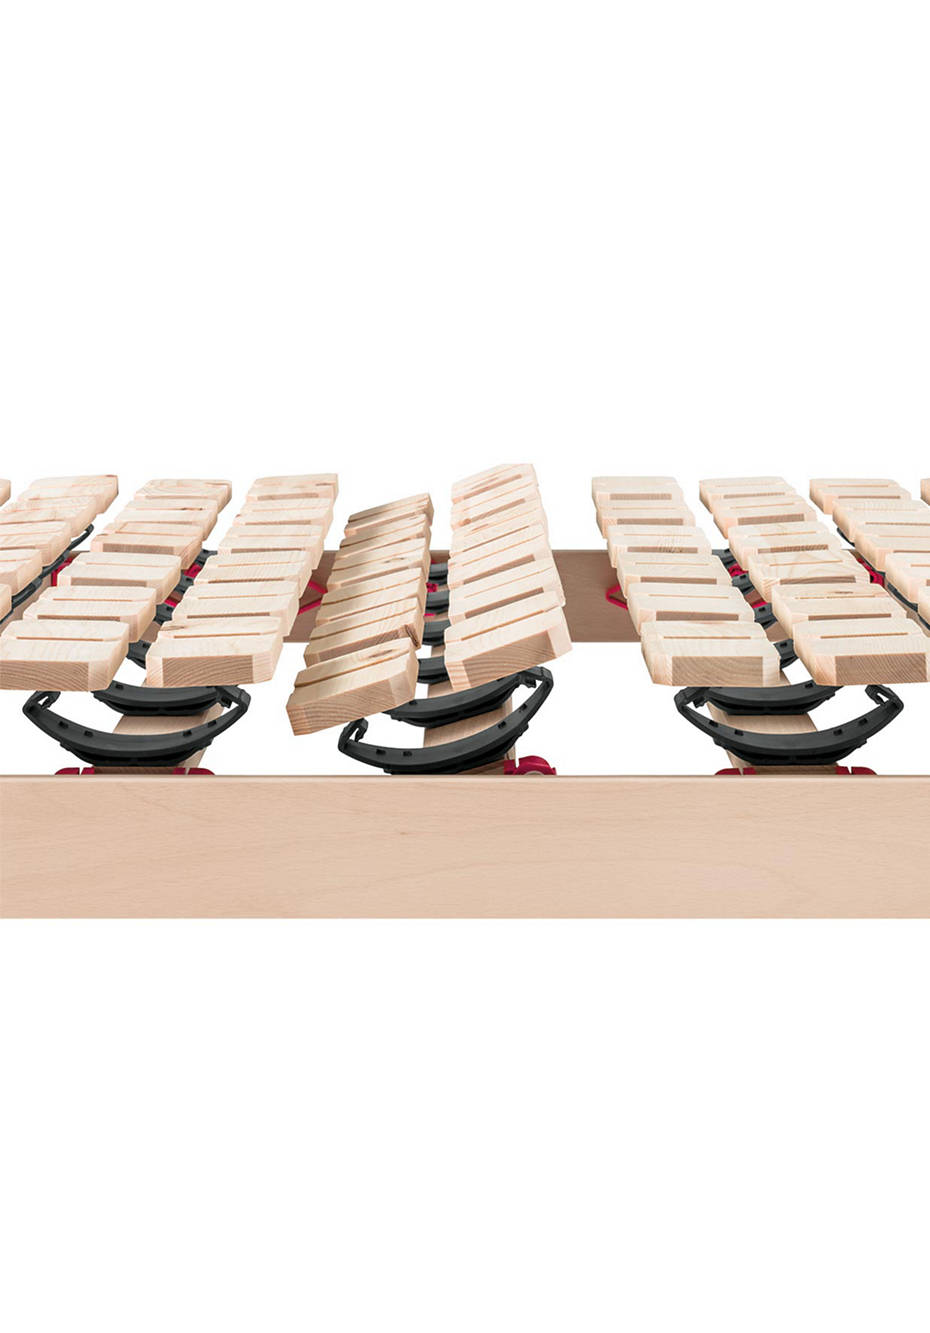 Teller-Lattenrost aus Zirbenholz